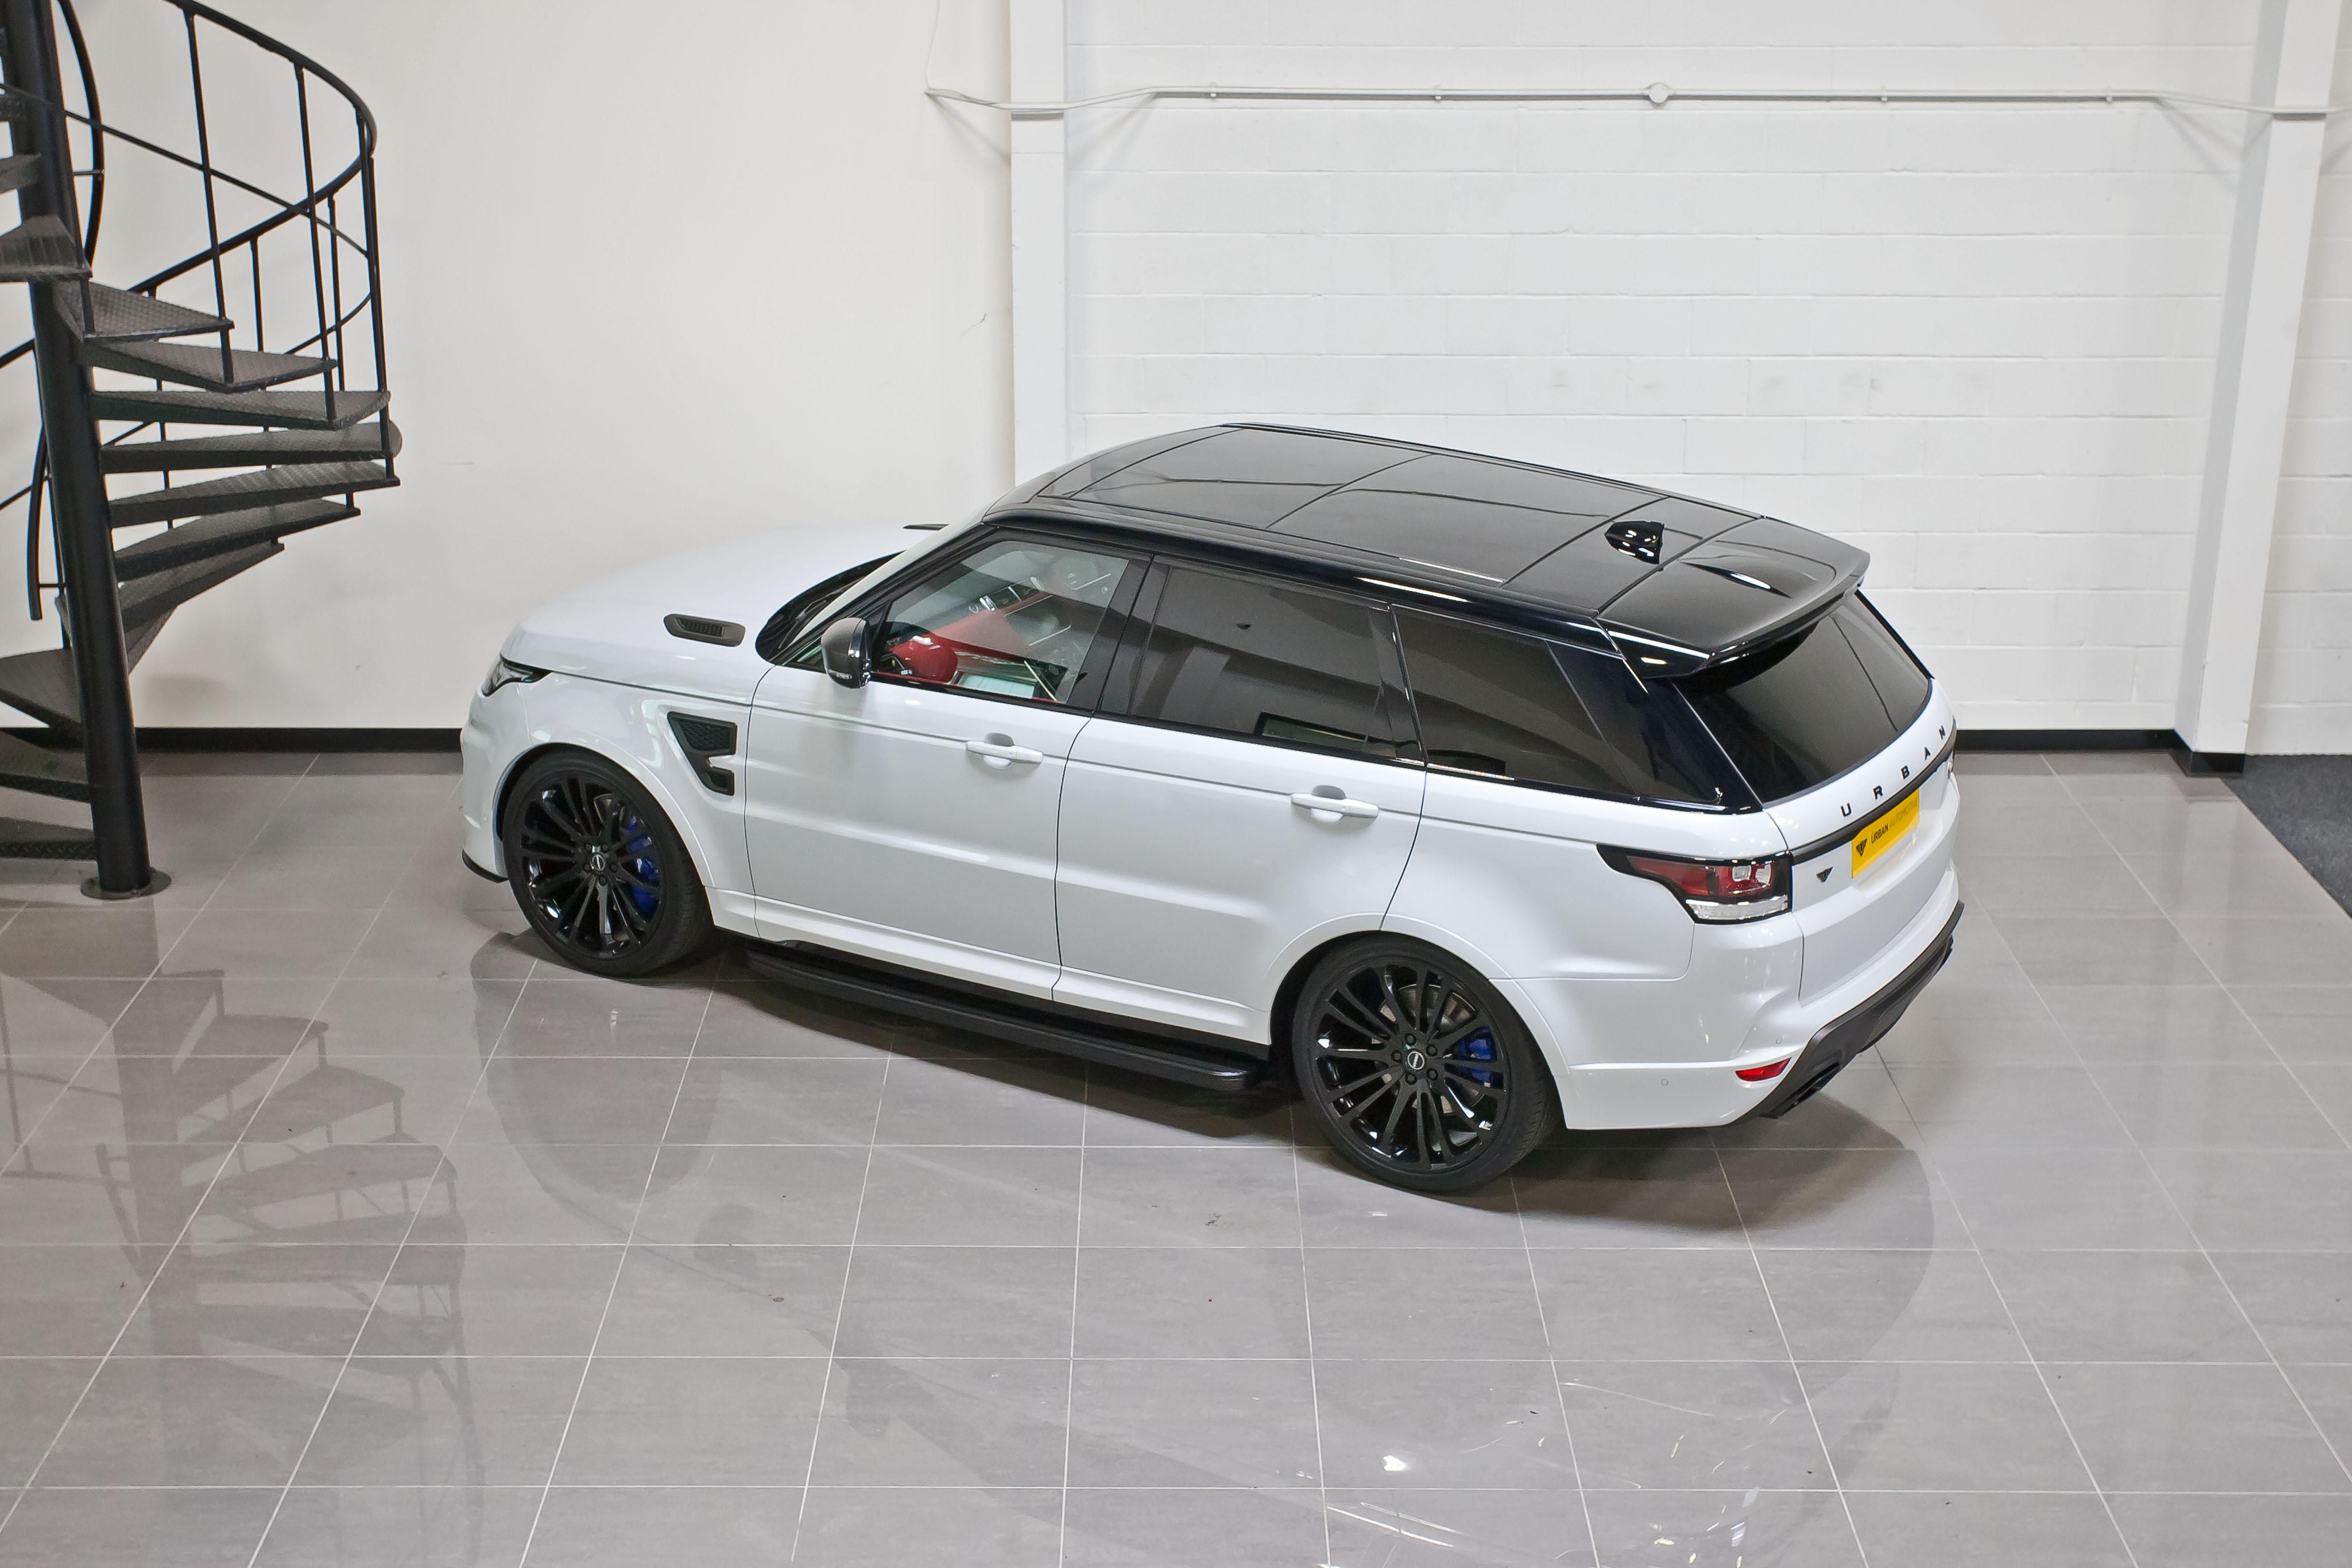 Range Rover SVR Yulong Matte Carbon46